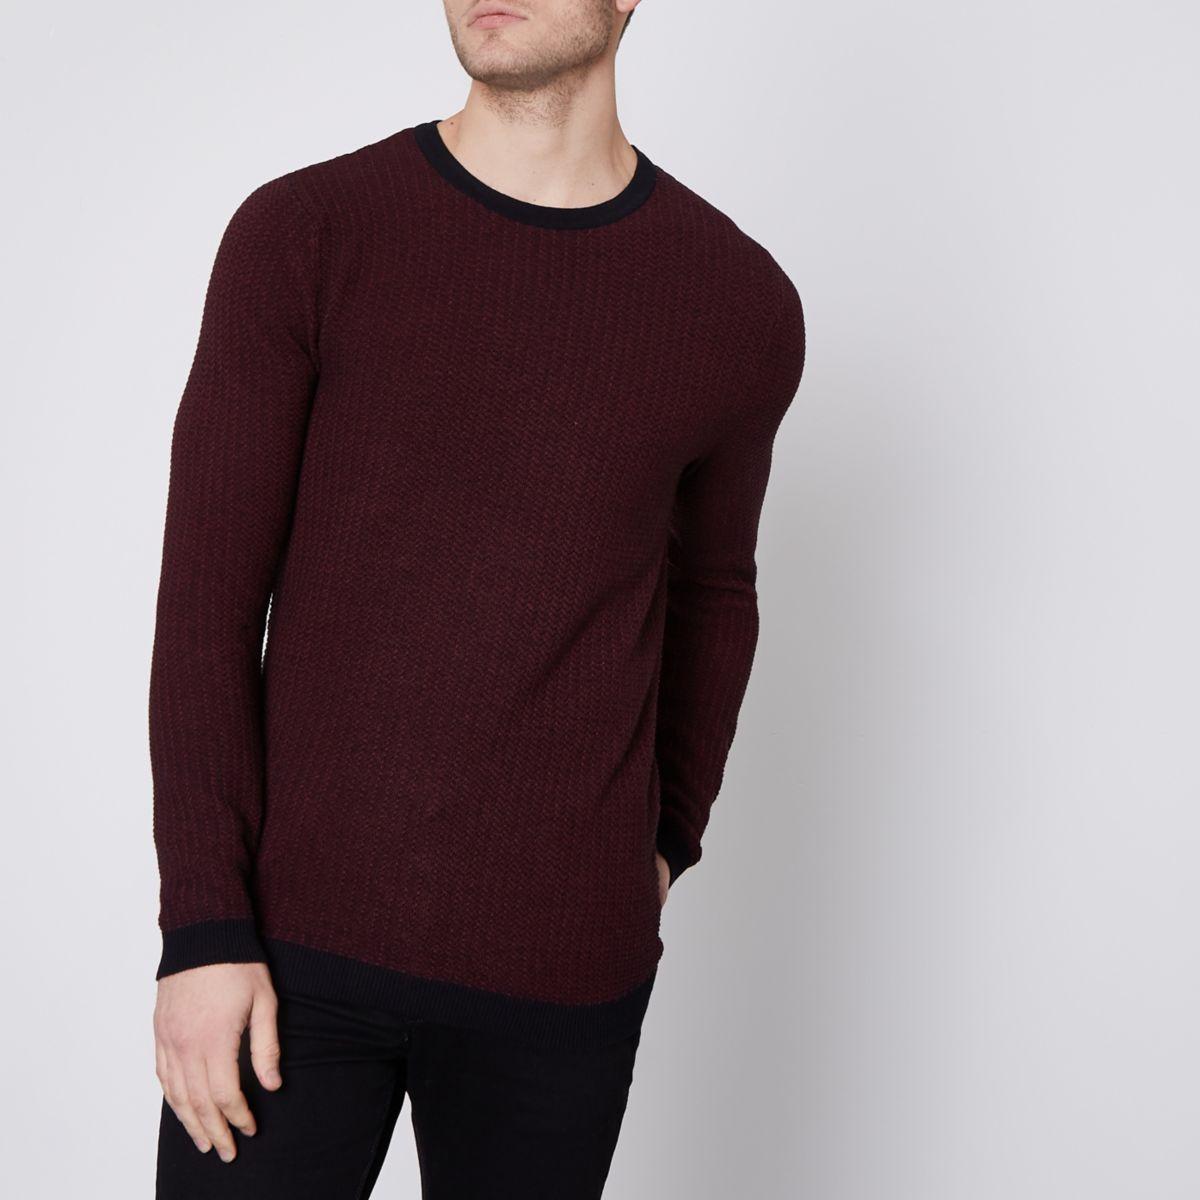 Burgundy Jack & Jones Premium knit jumper